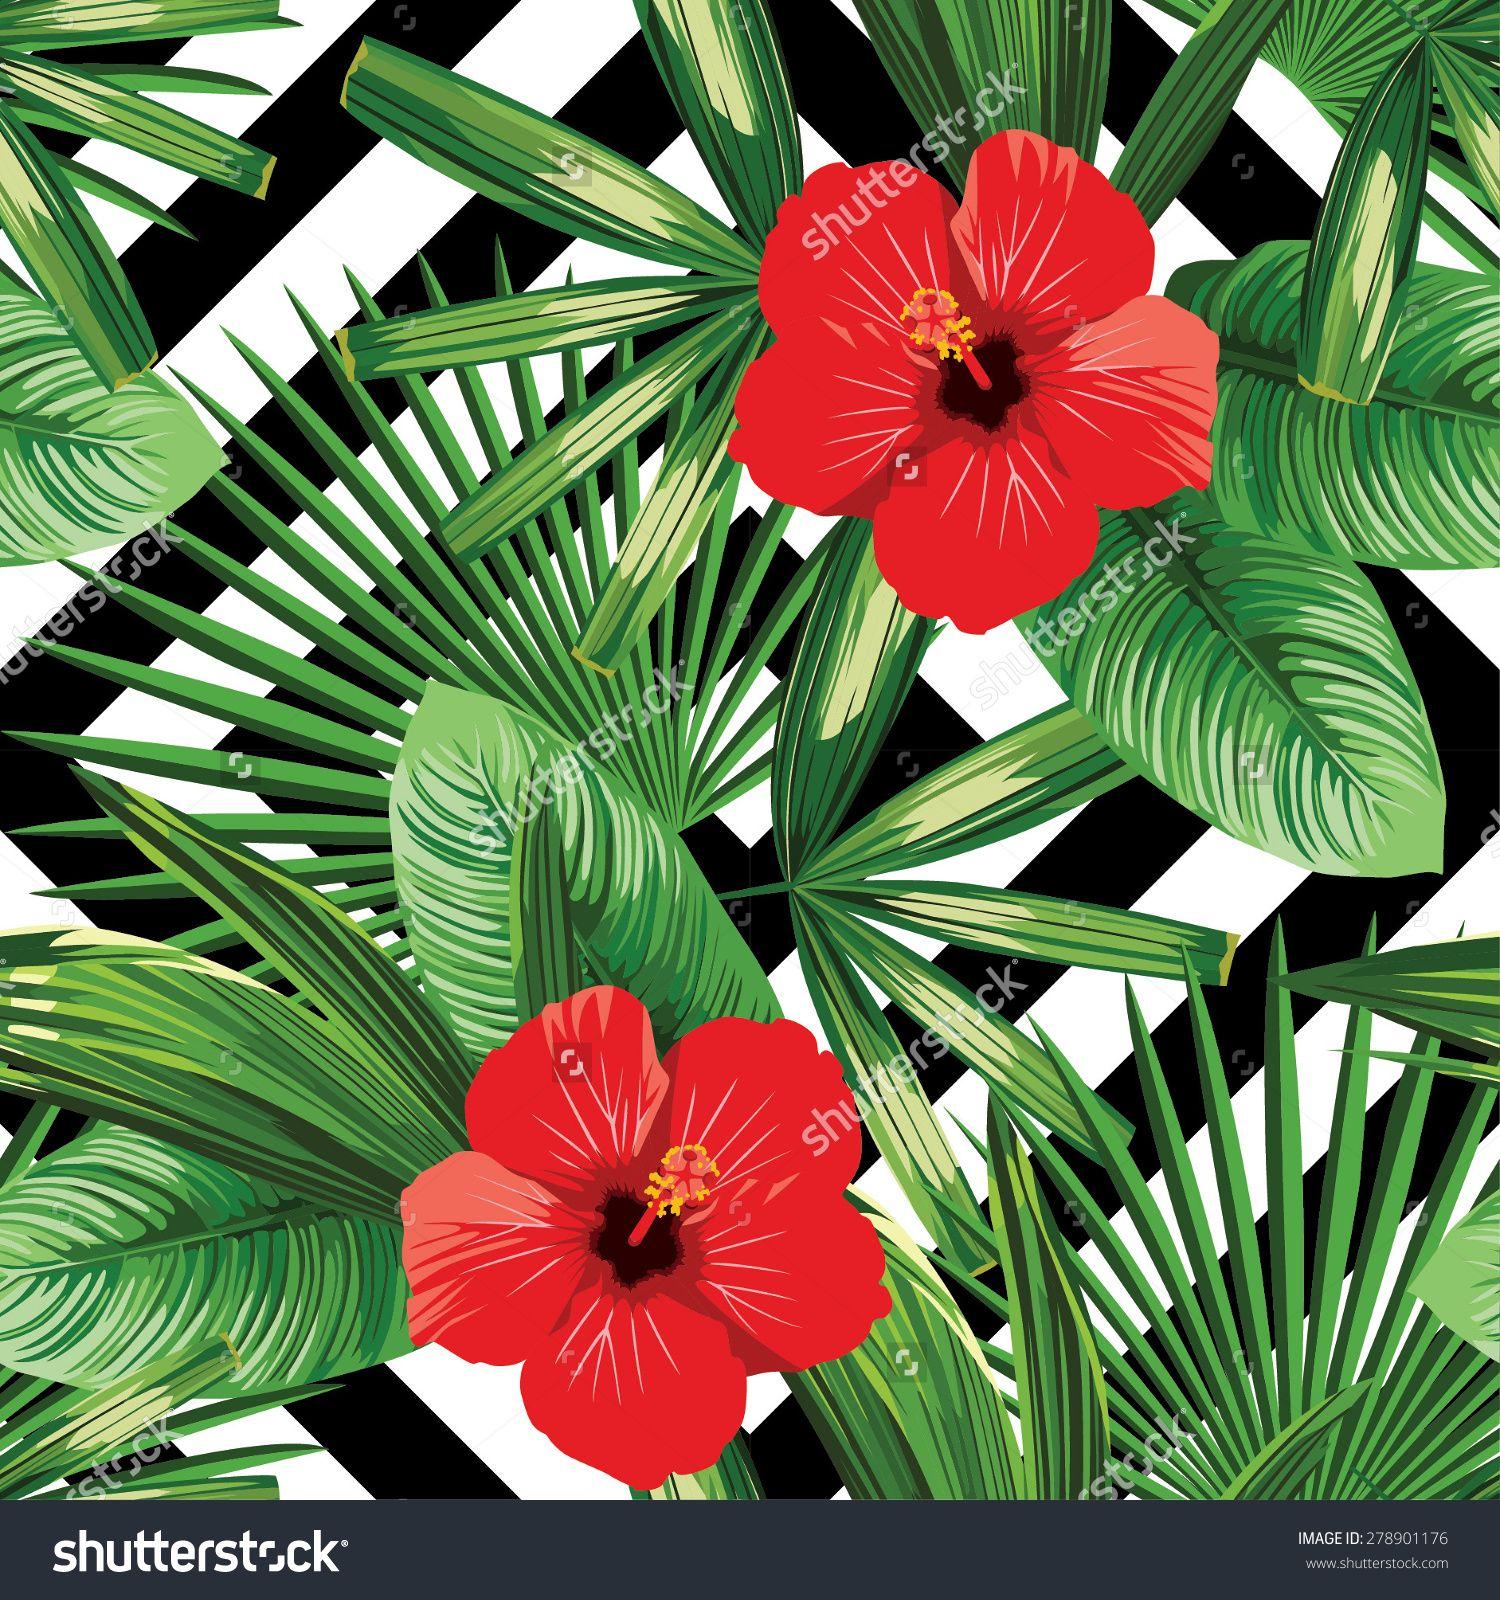 stockvectortropicalflowersandleavespatternblackand